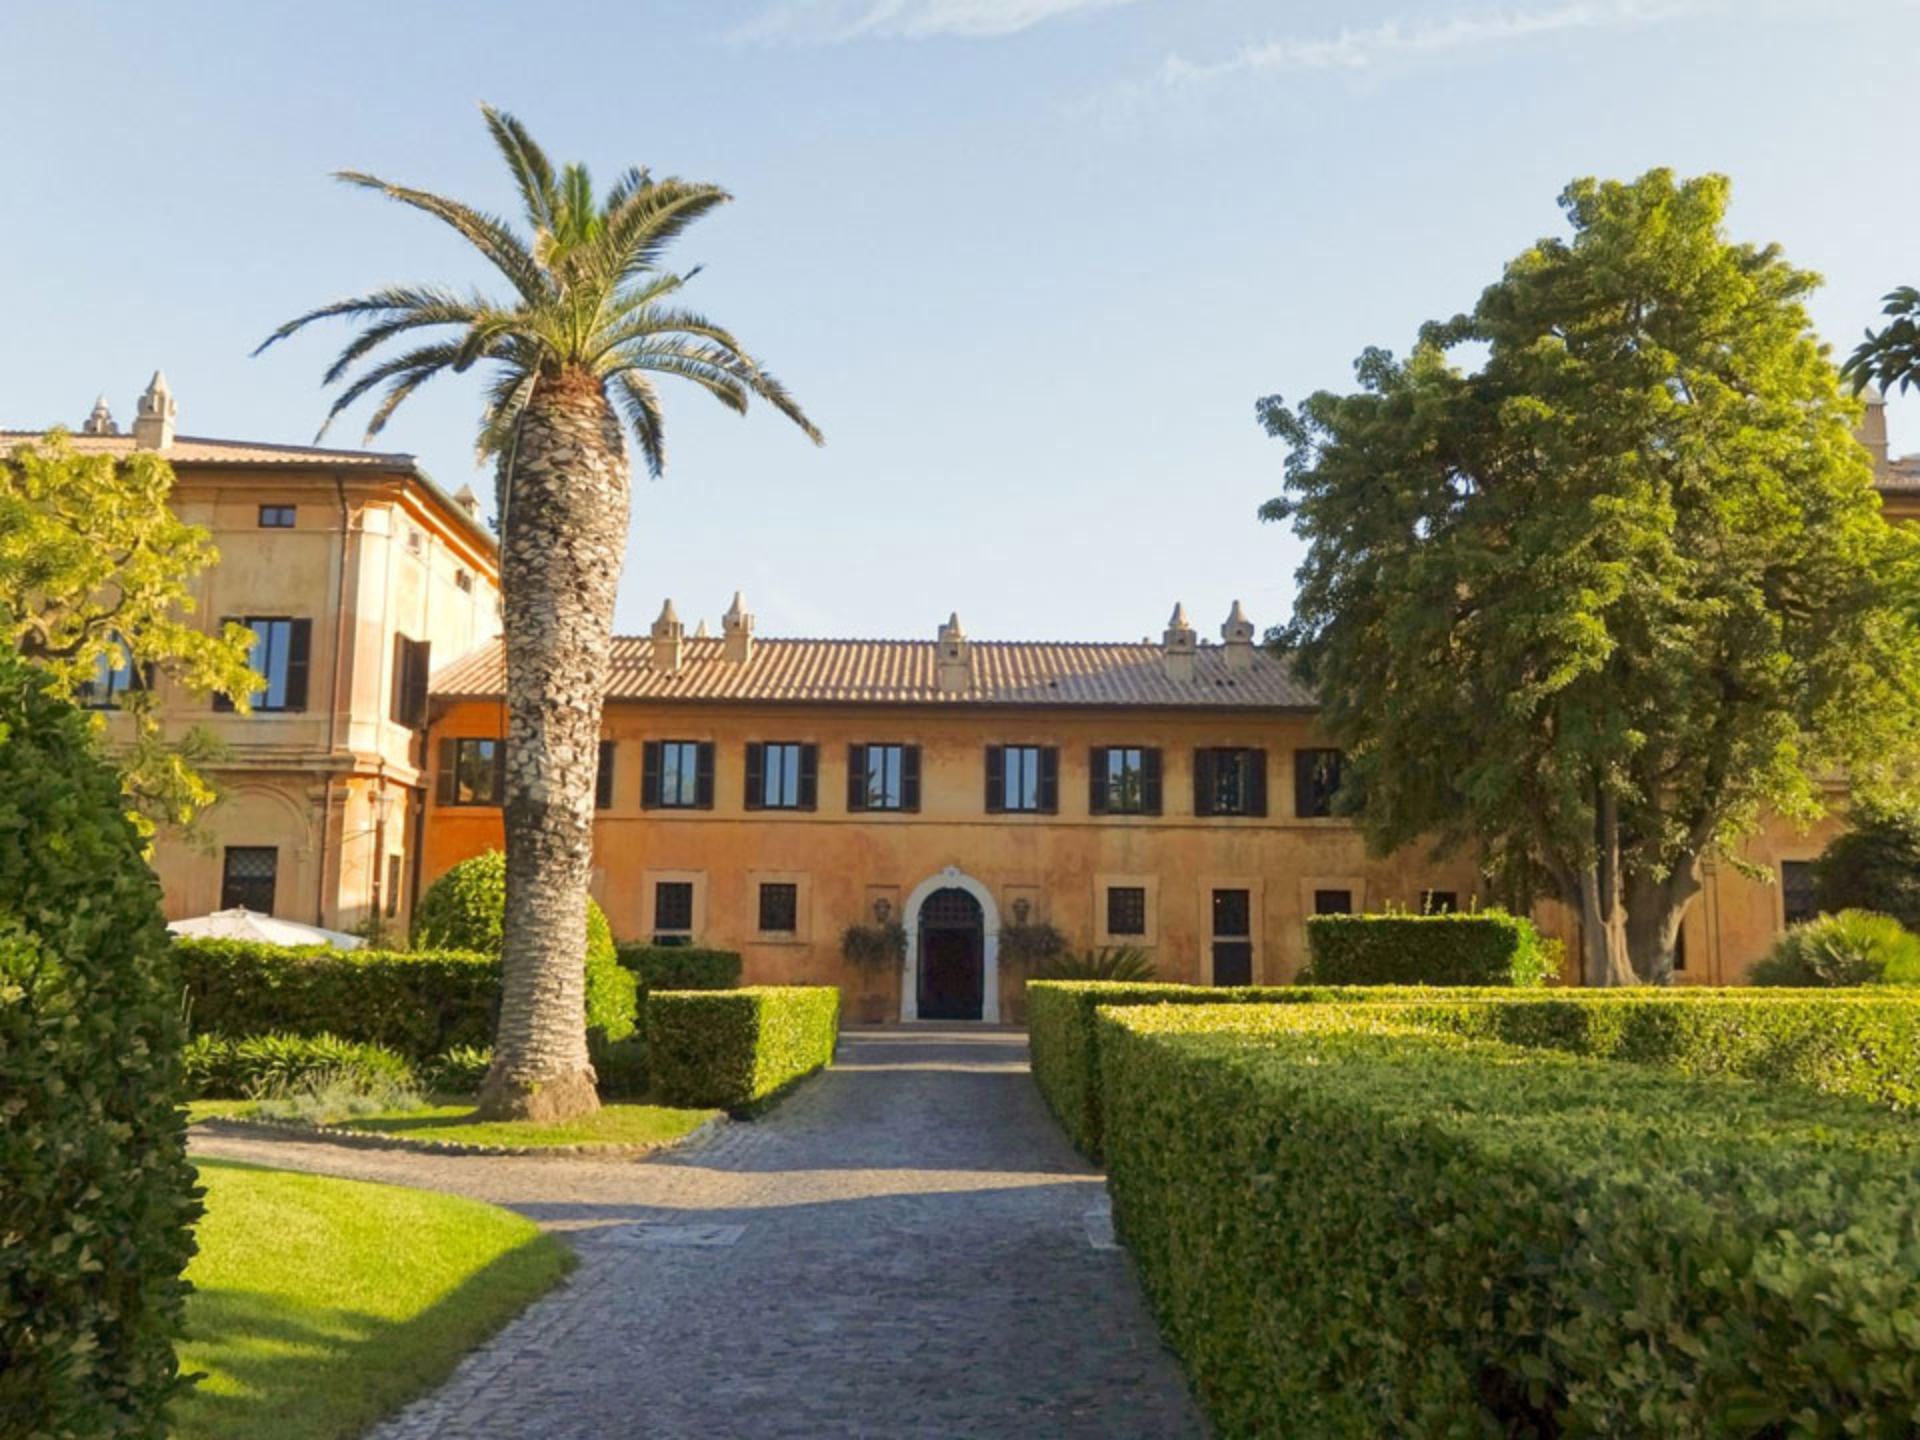 etruscan-cerveteri_Italy-Tour-With-Theresa_04